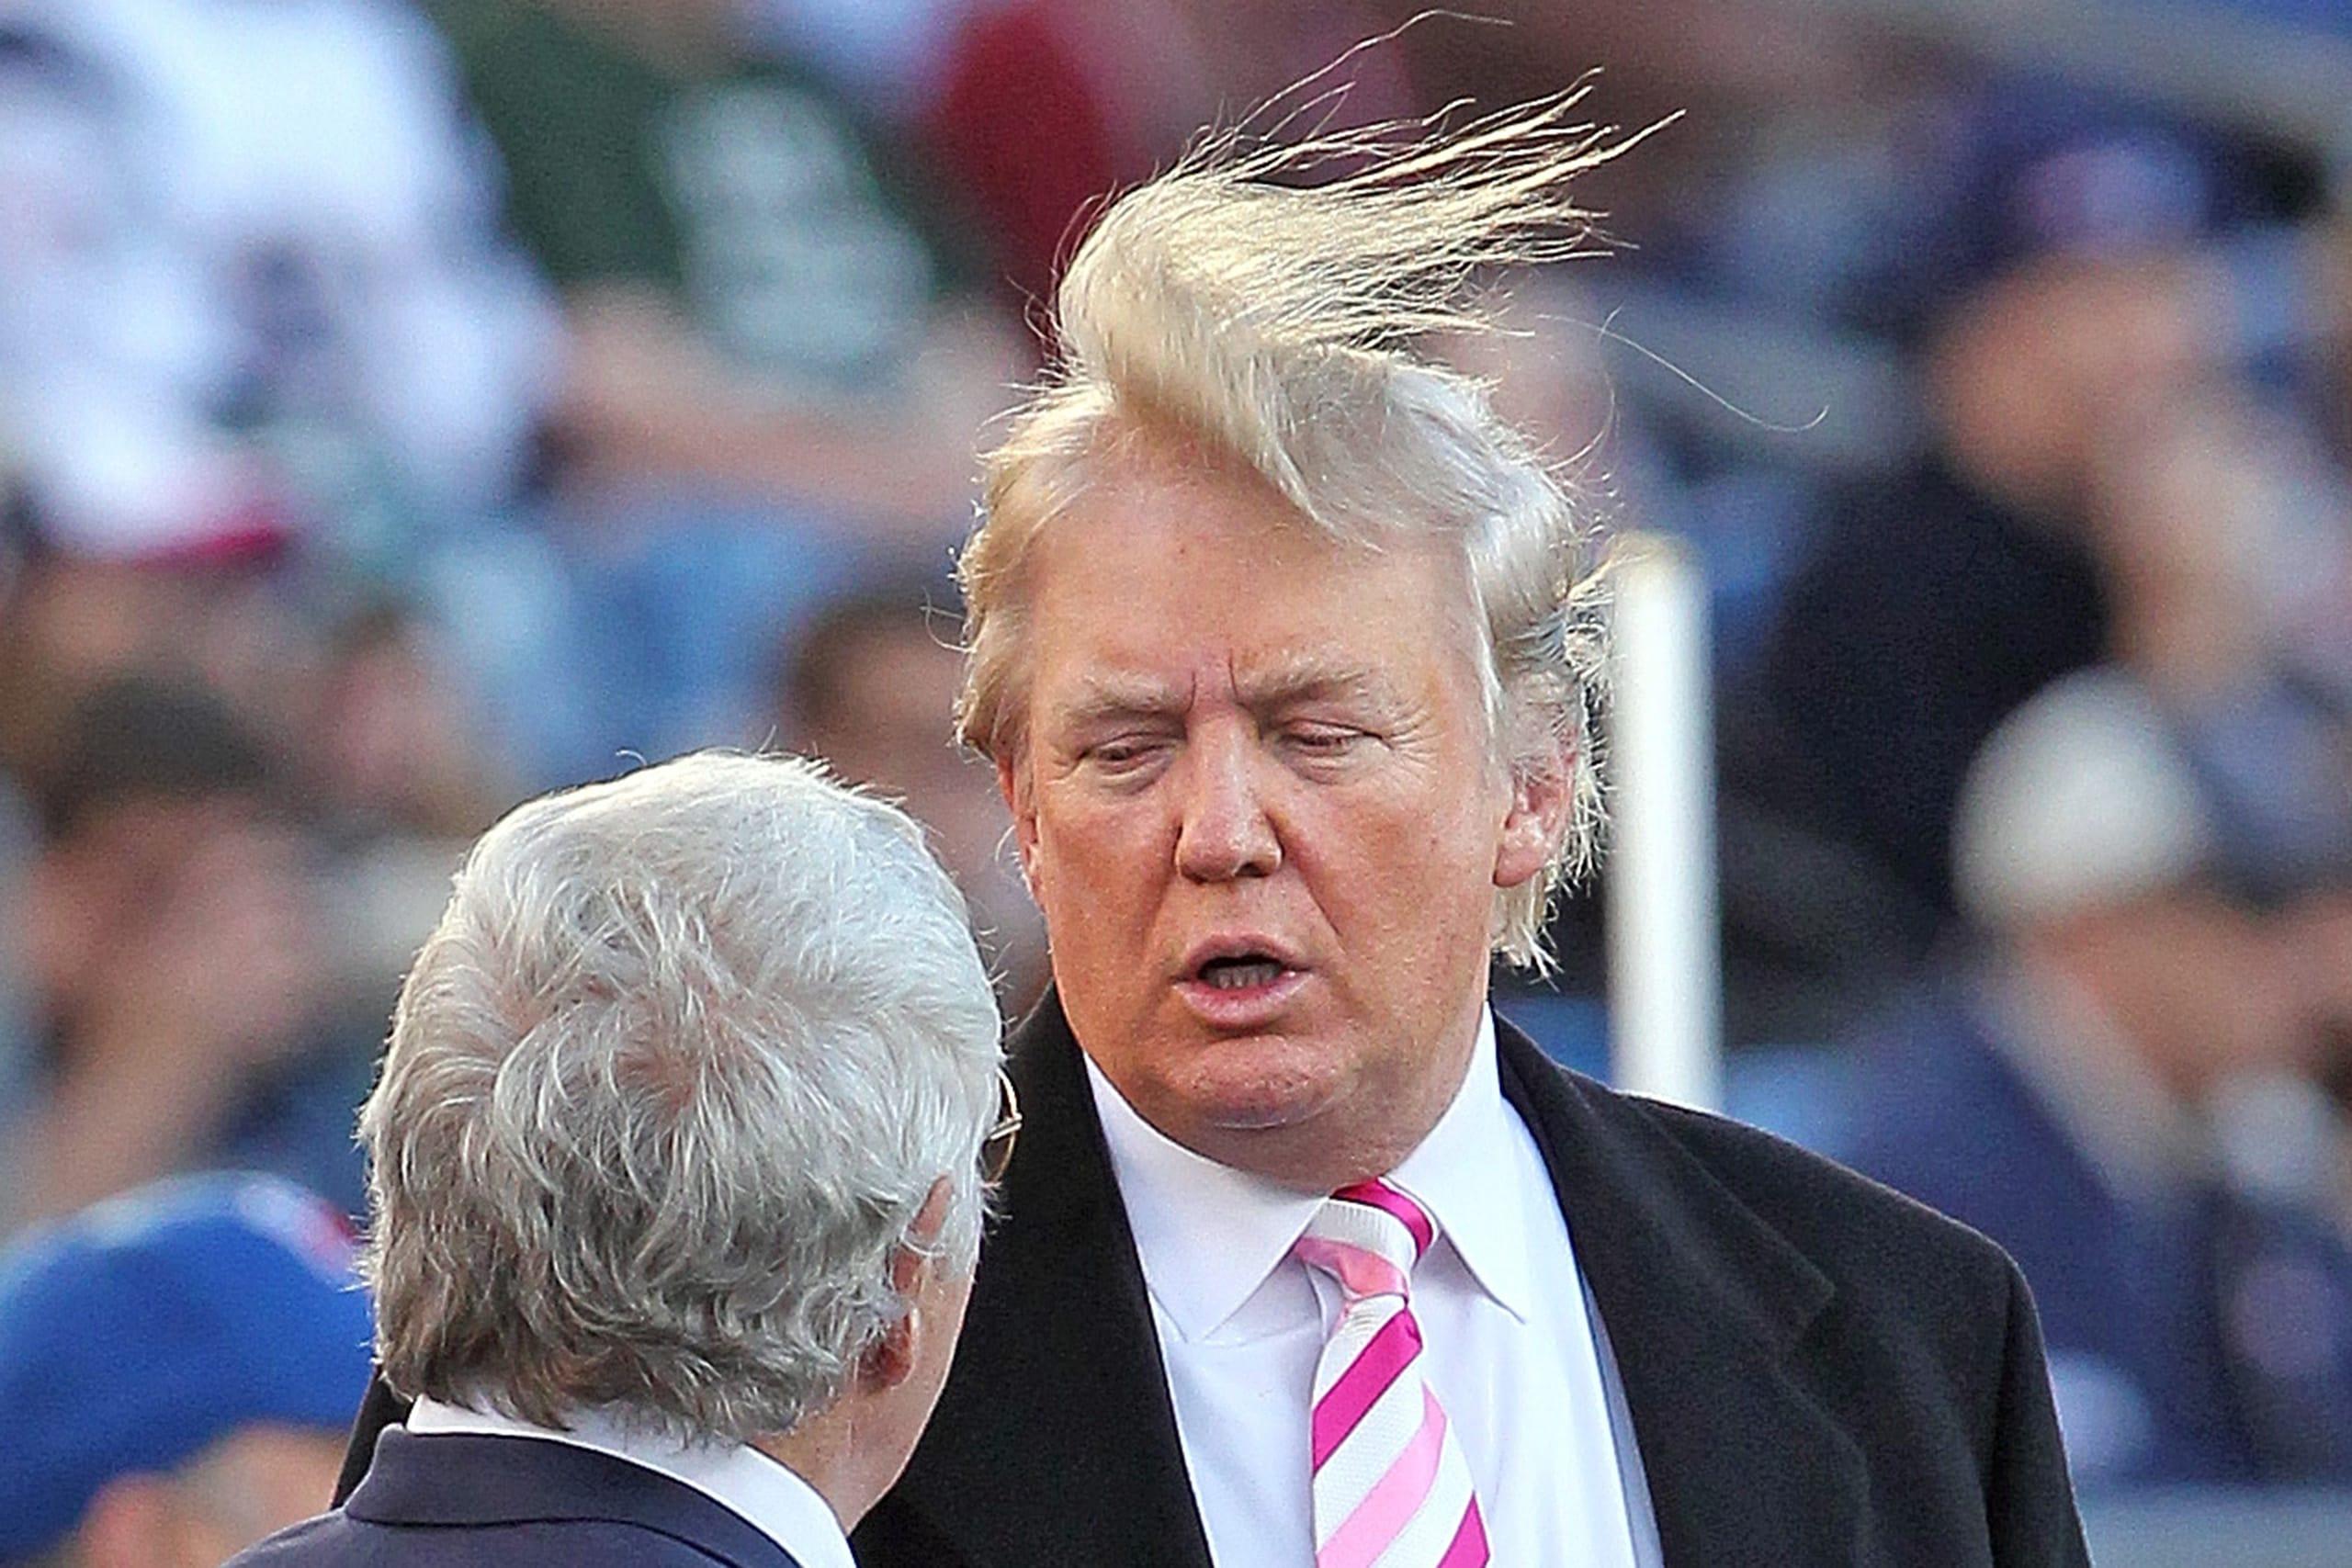 Håravfall Trump